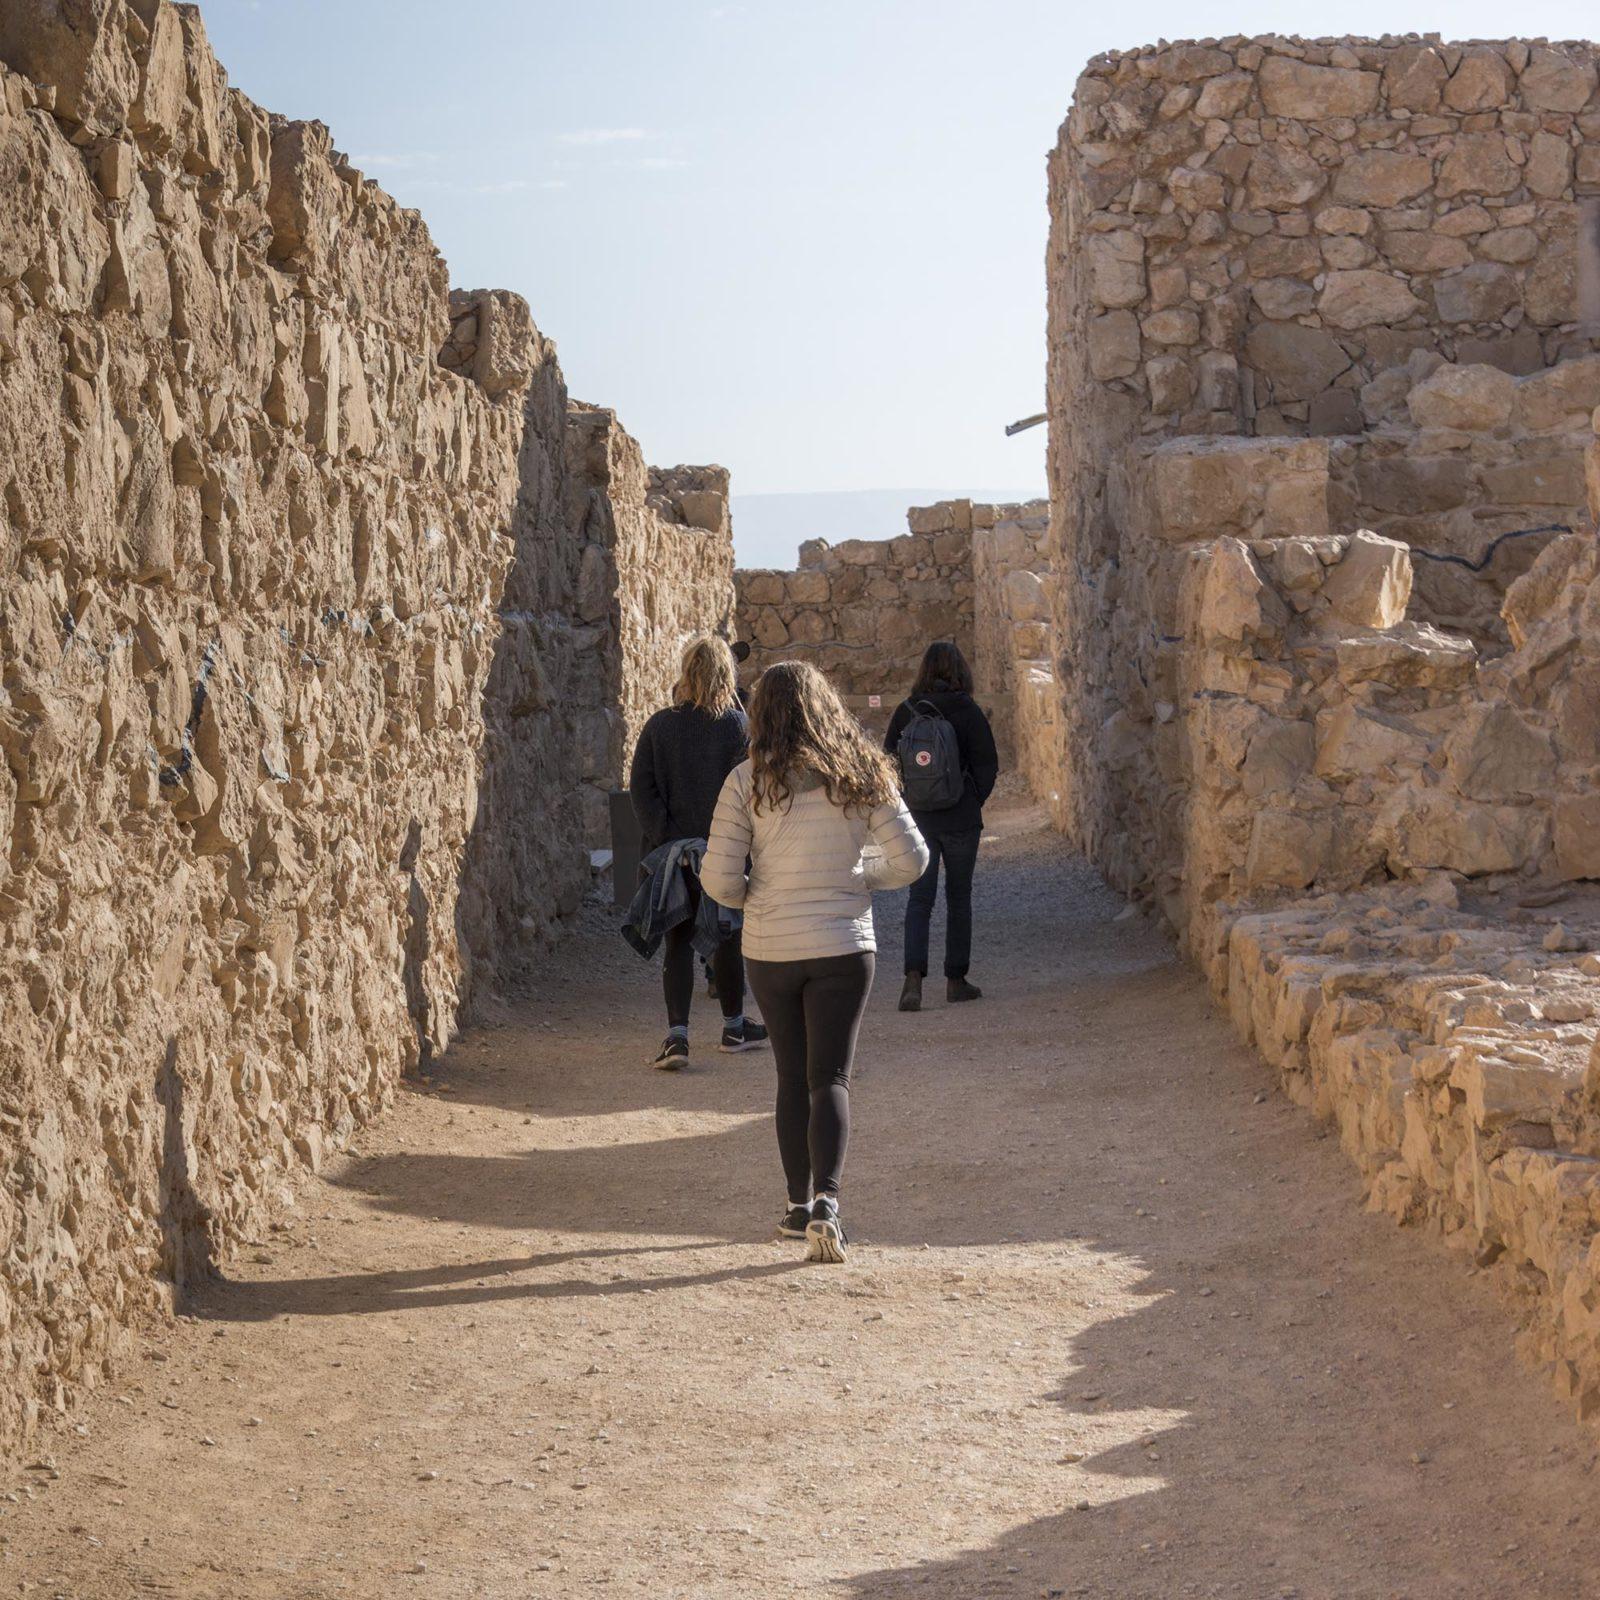 Tourists walking at fort, Masada, Judean Desert, Dead Sea Region, Israel